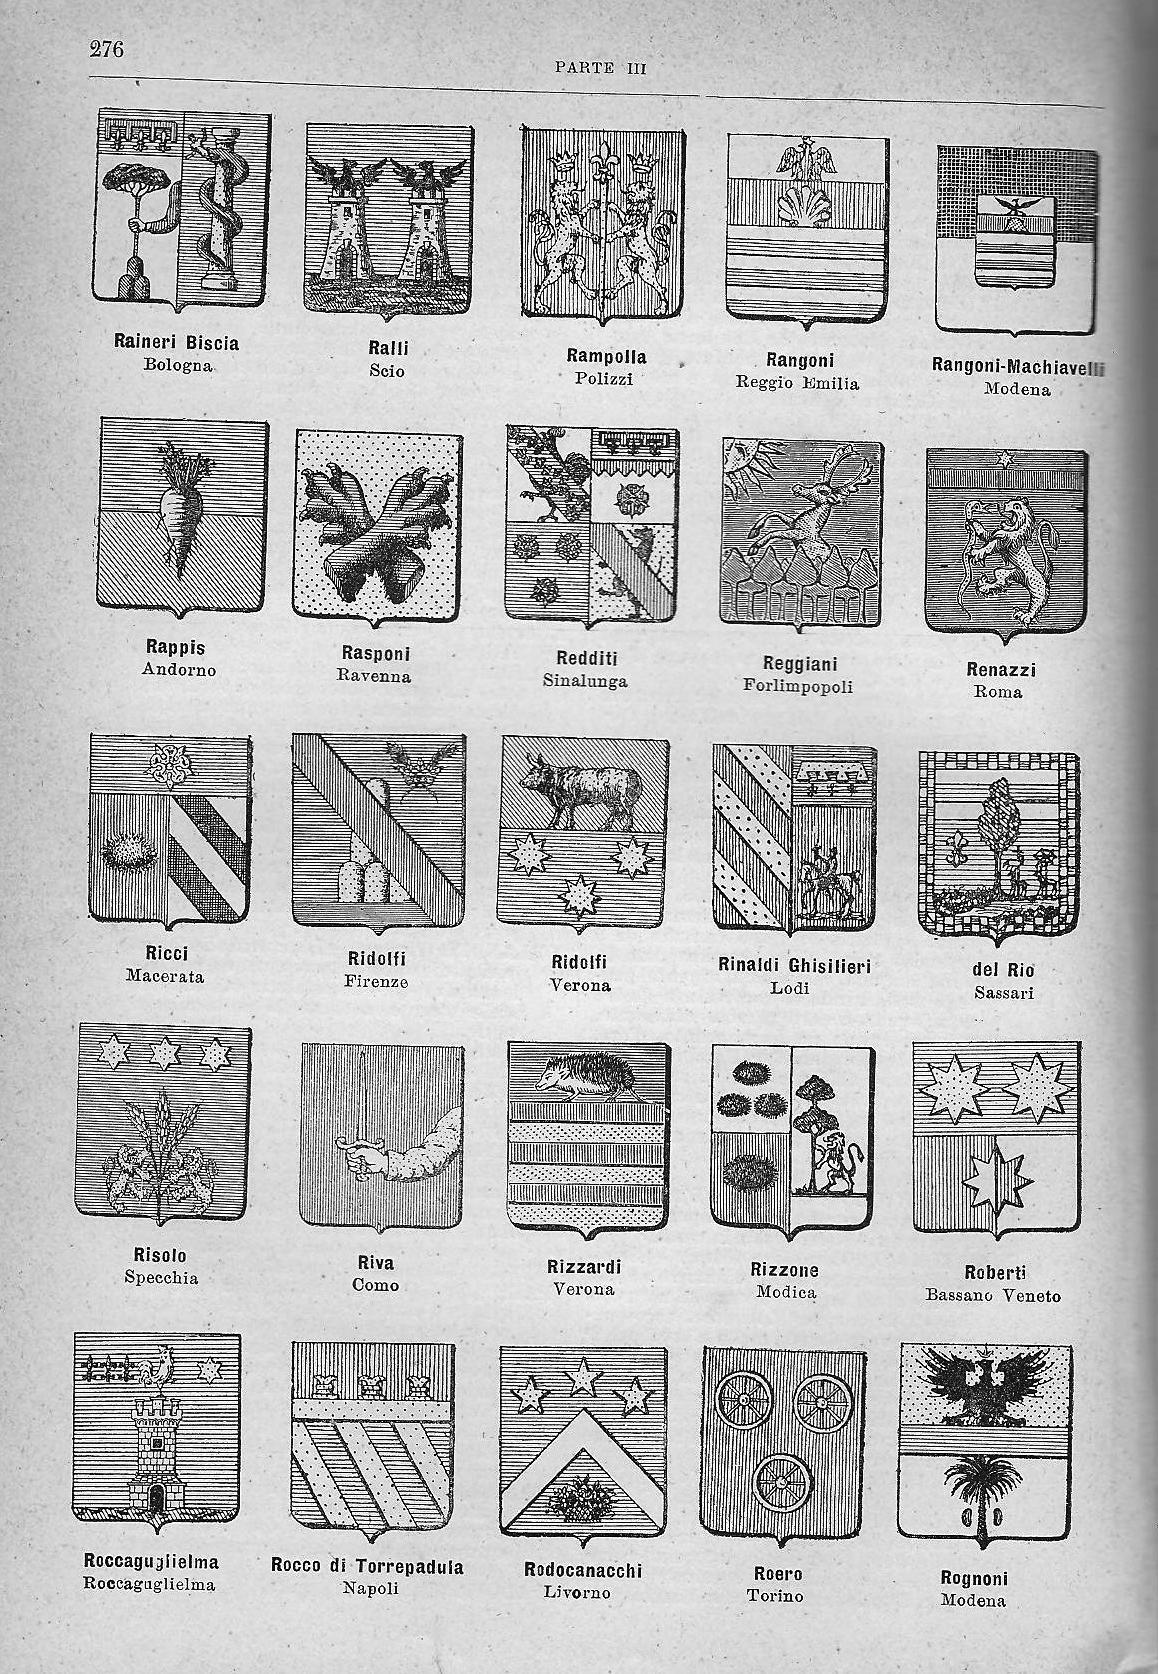 Calendario 1900.File Calendario D Oro 1900 Pagina 276 Jpg Wikimedia Commons